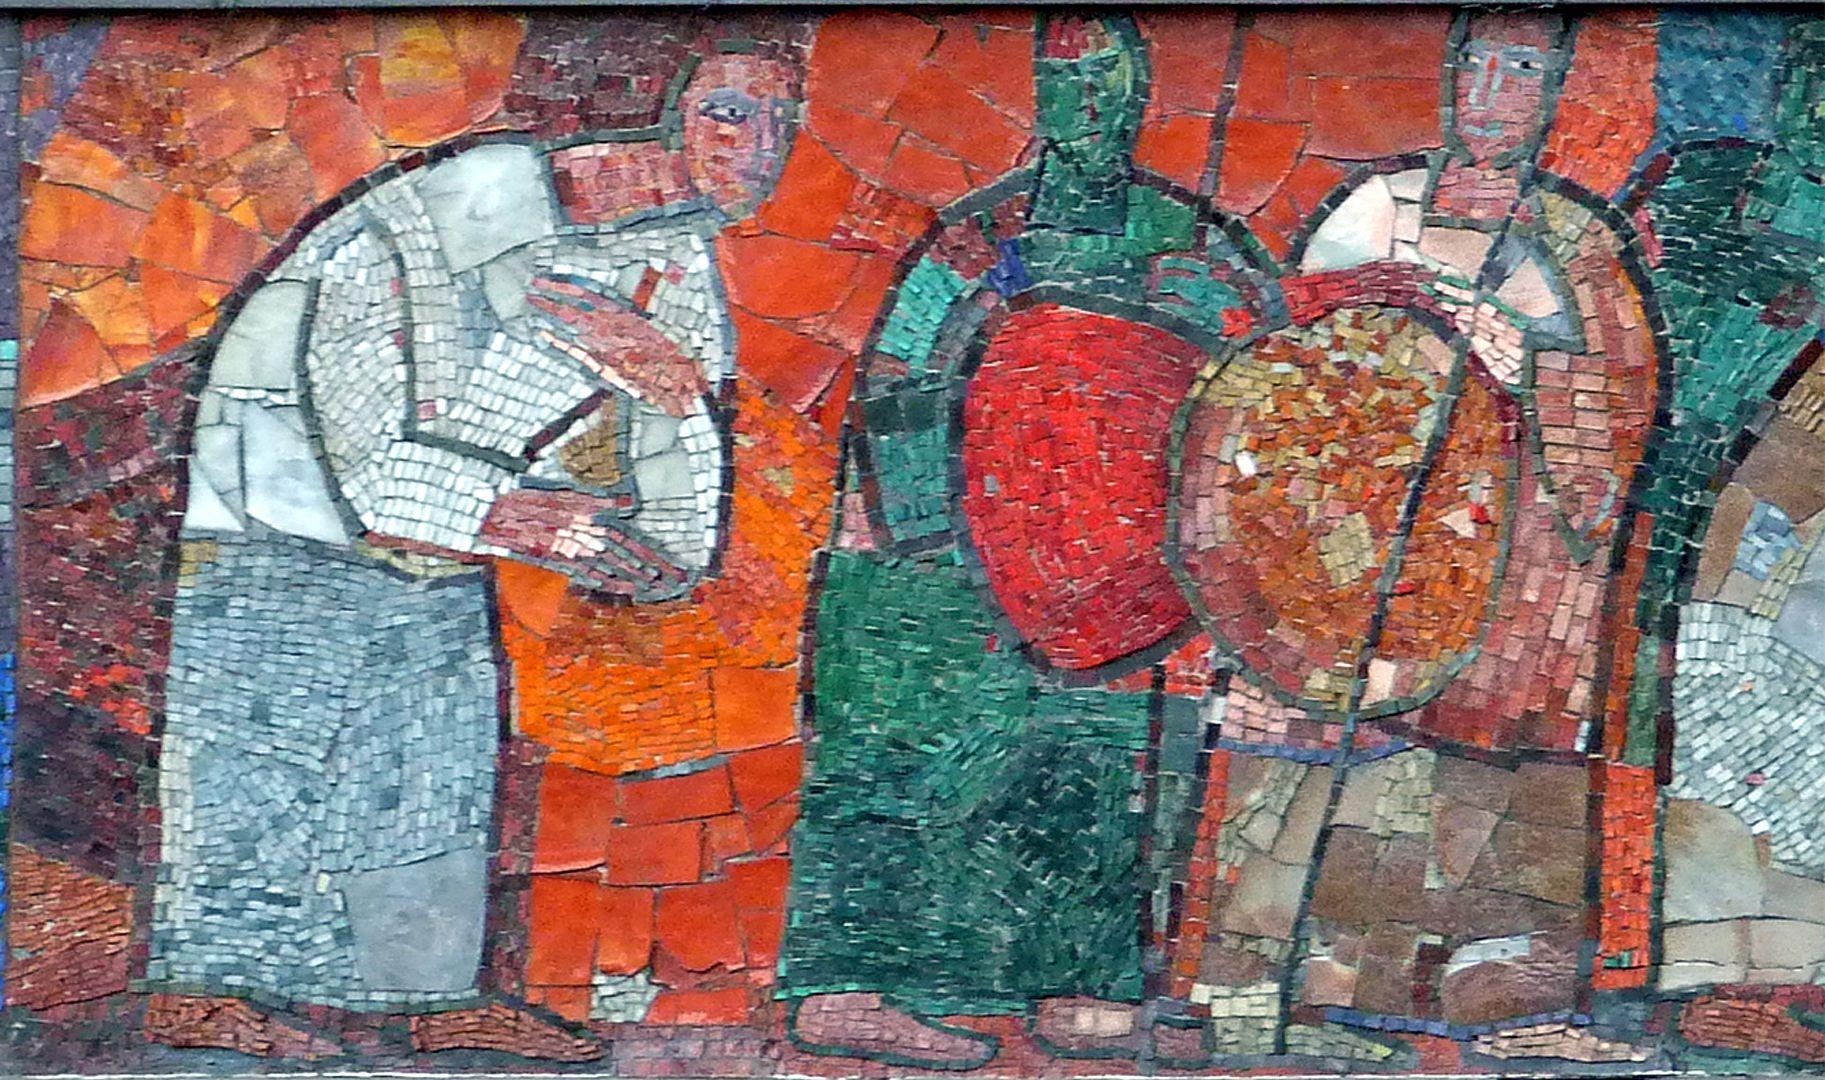 Mosaik am Hauptmarkt in Nürnberg Käufer und Händler